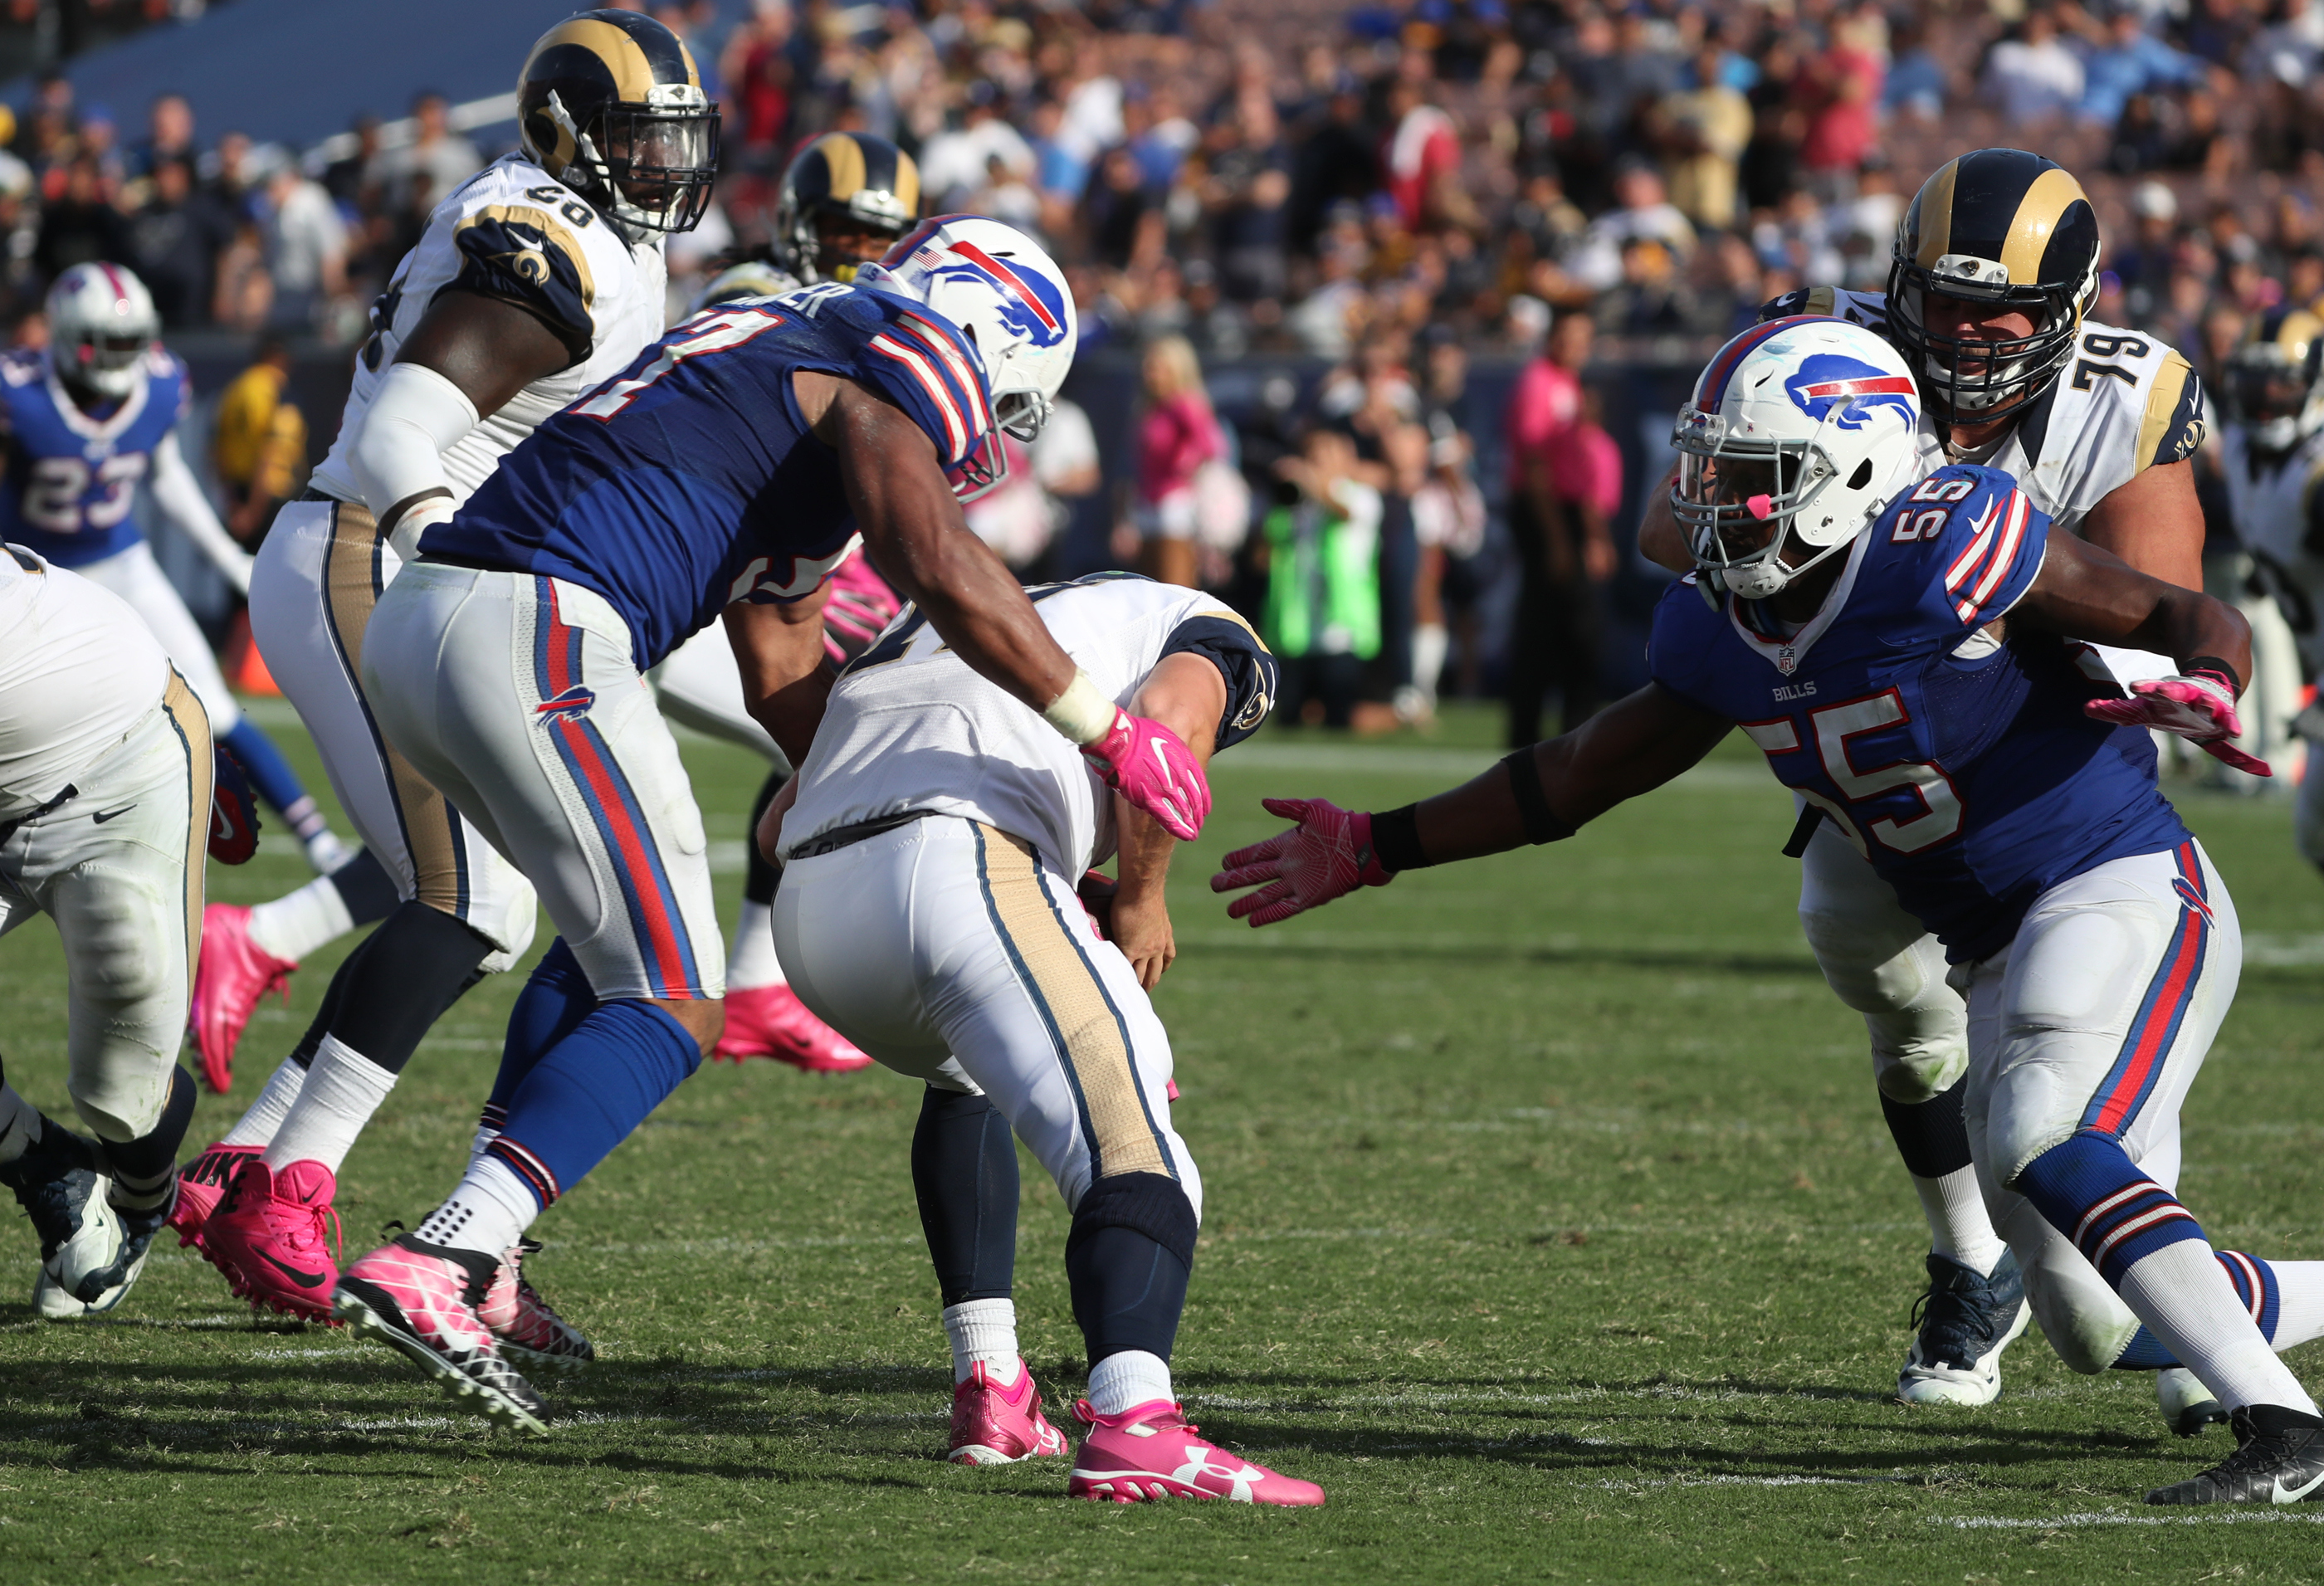 Lorenzo Alexander is having a career season on defense with the Bills (James P. McCoy/Buffalo News)